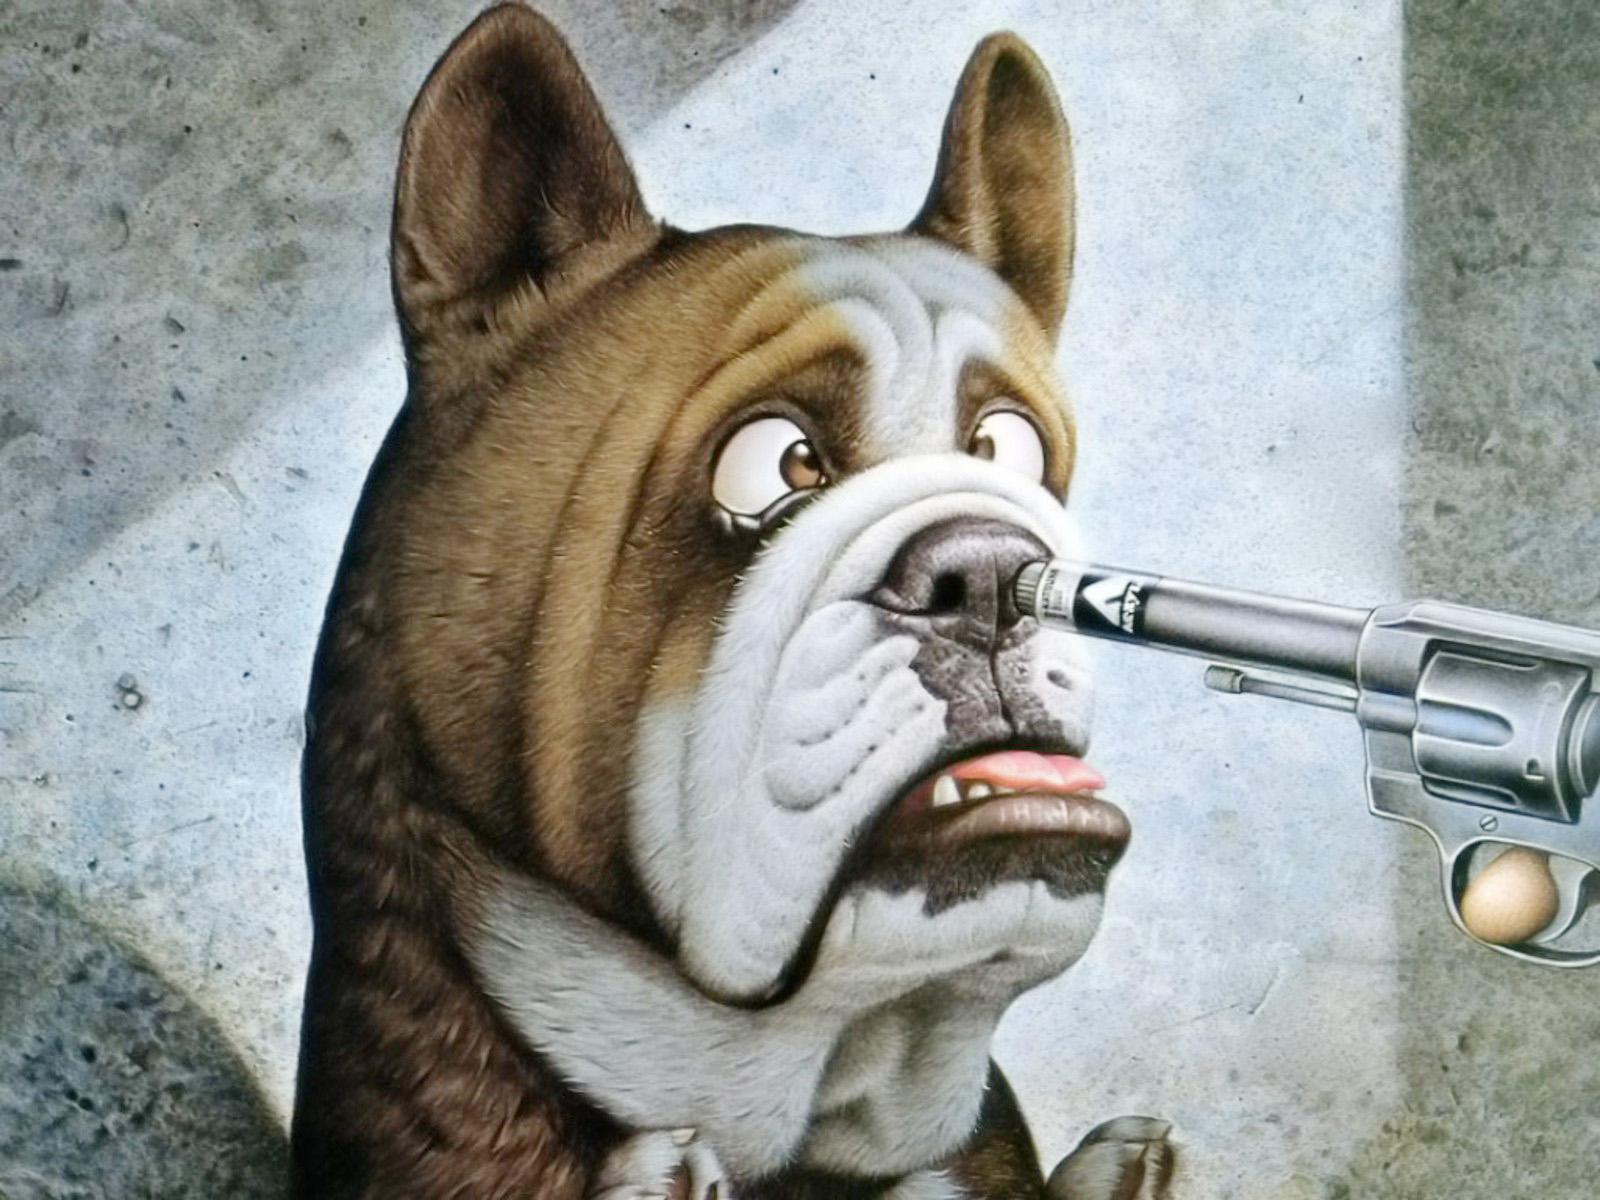 Funny dog pistol 1600 x 1200 download close